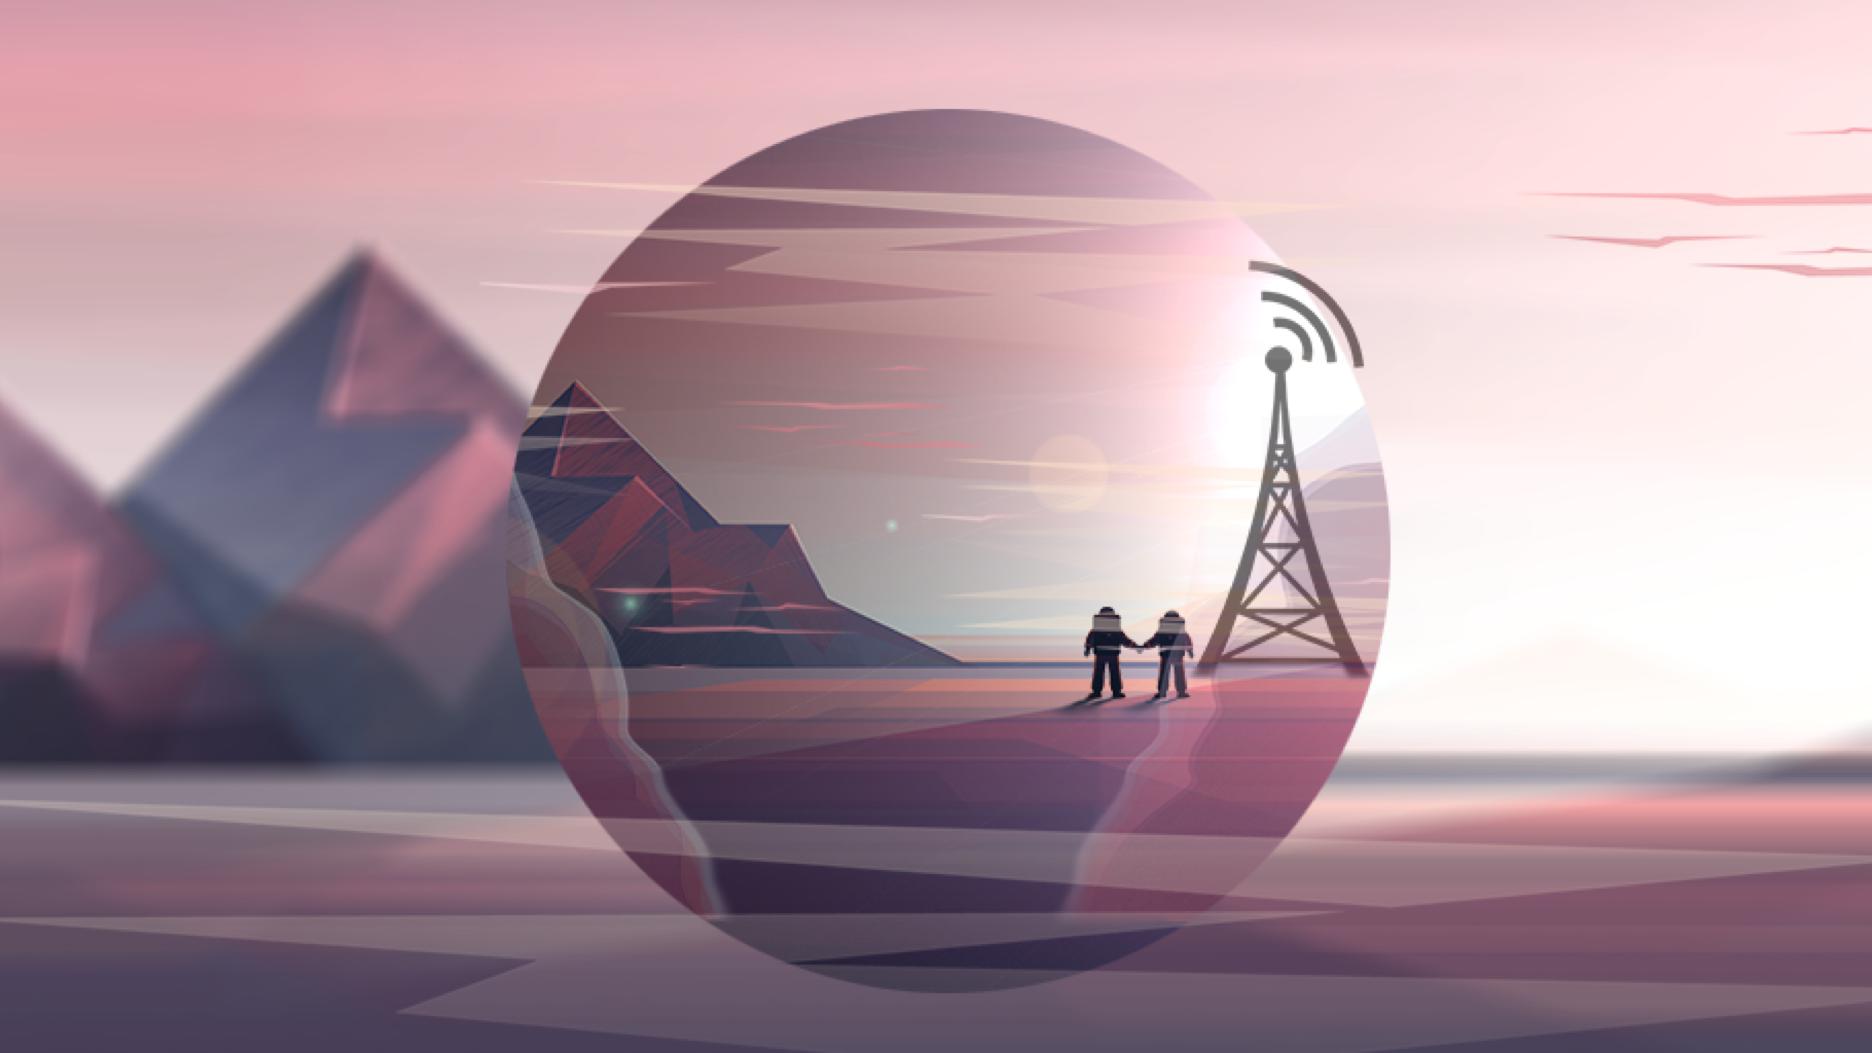 magic-leap-korean-5g-telecom